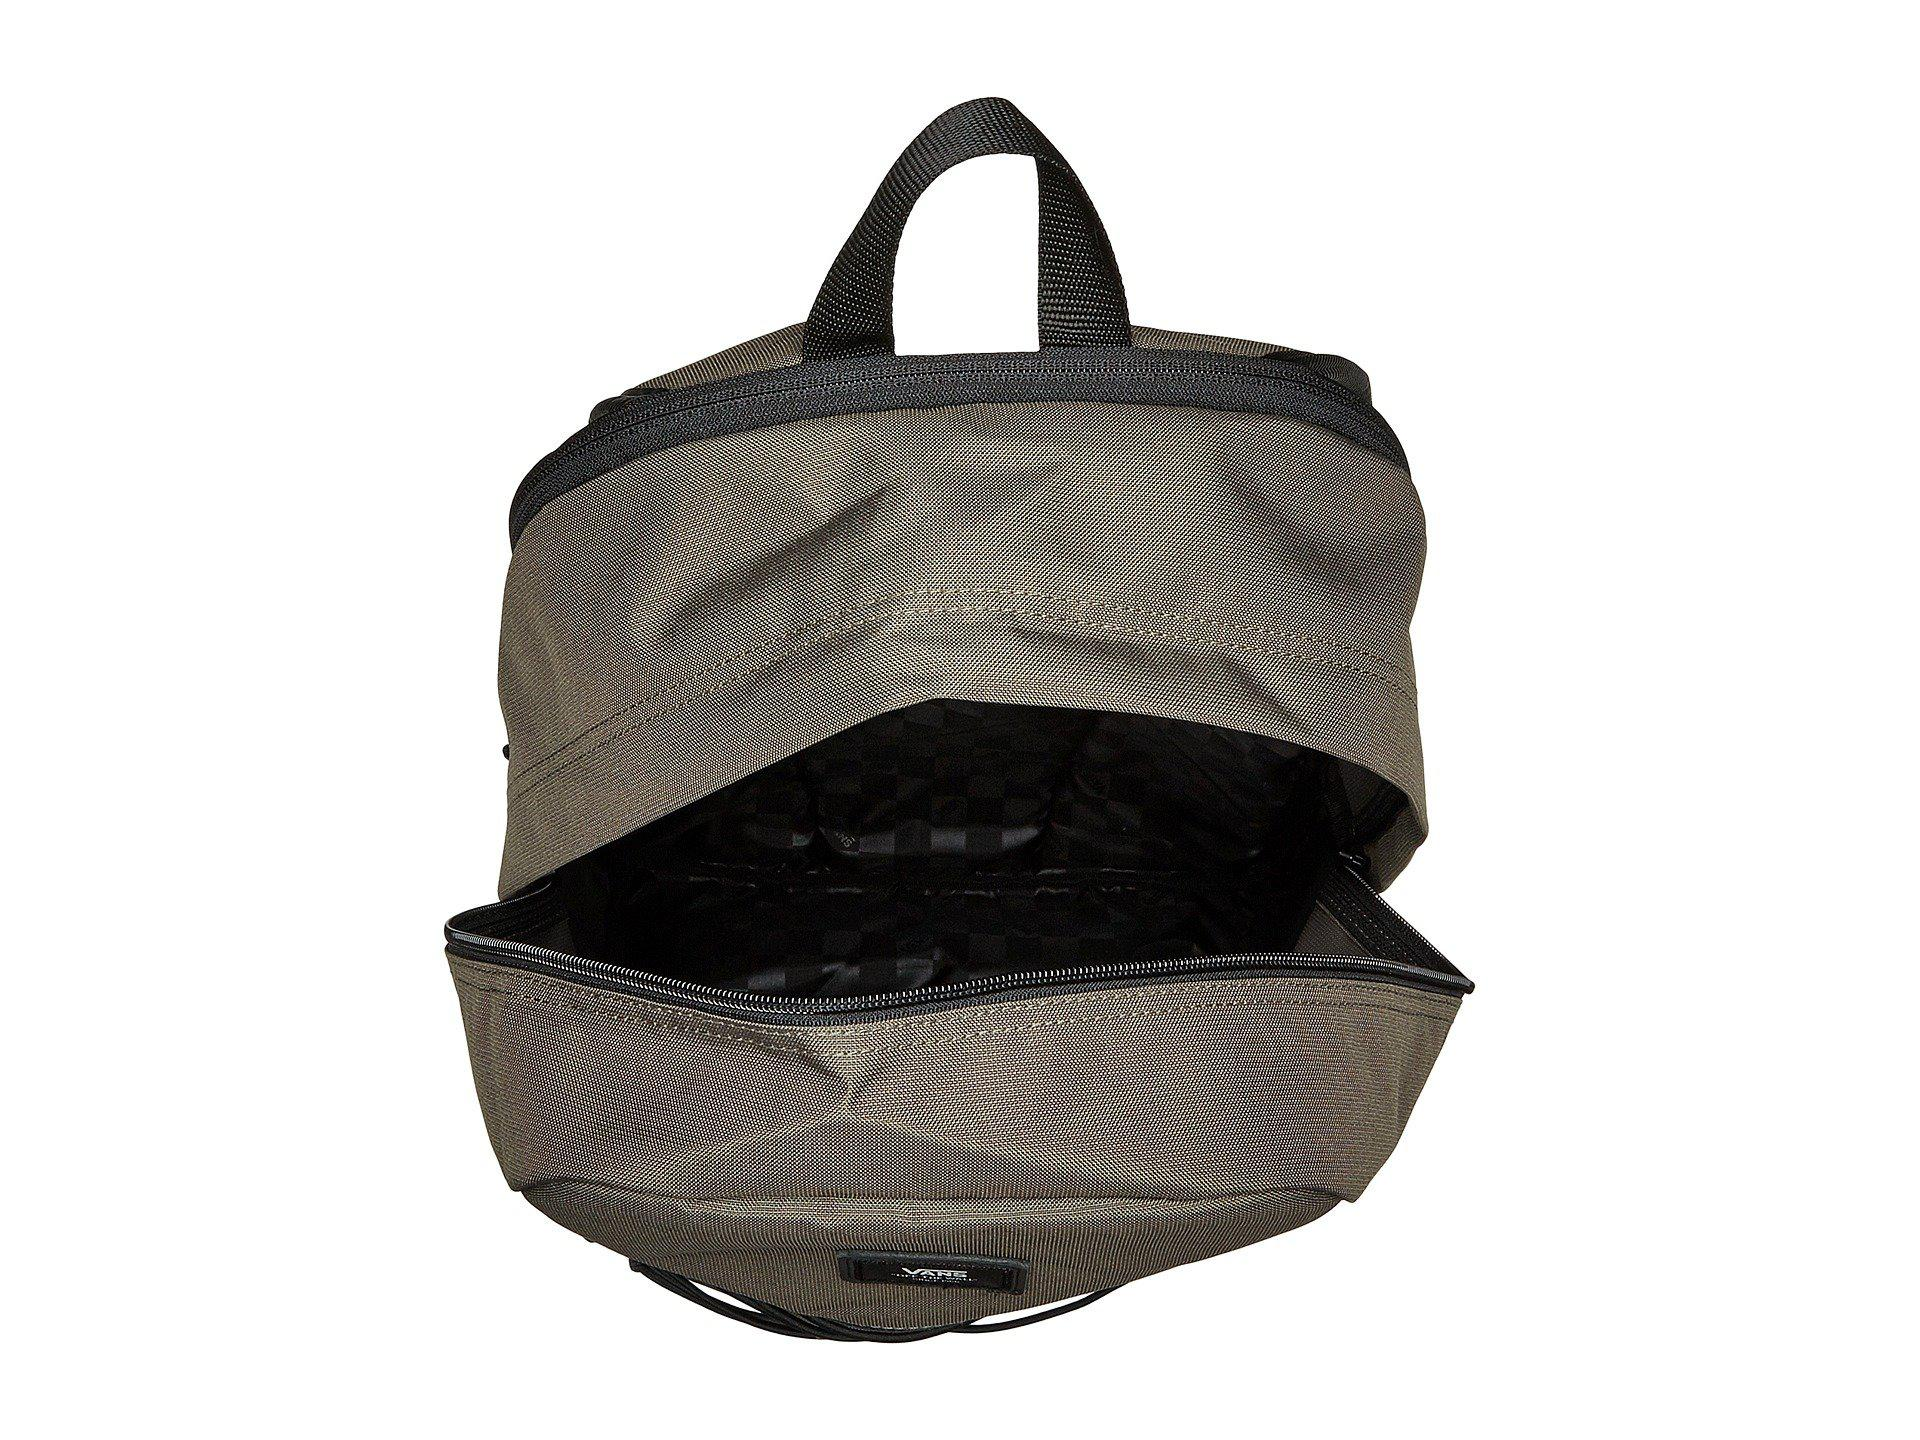 d366382141 Shad SL86 Source · Lyst Vans Snag Plus Backpack grape Leaf Backpack Bags in  Black